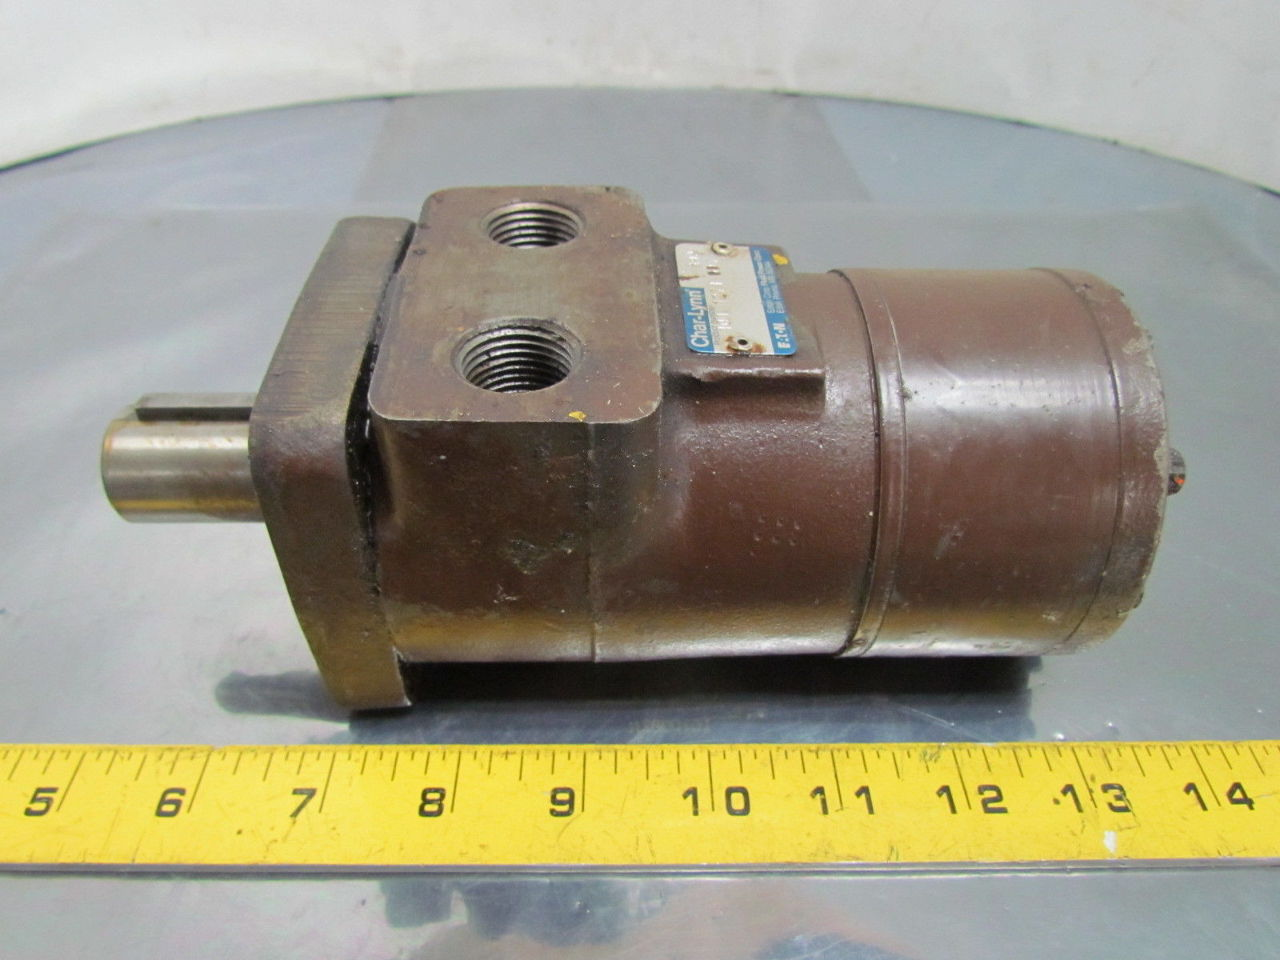 Char lynn eaton 101 1271 007 h series spool valve for Char lynn eaton hydraulic motors